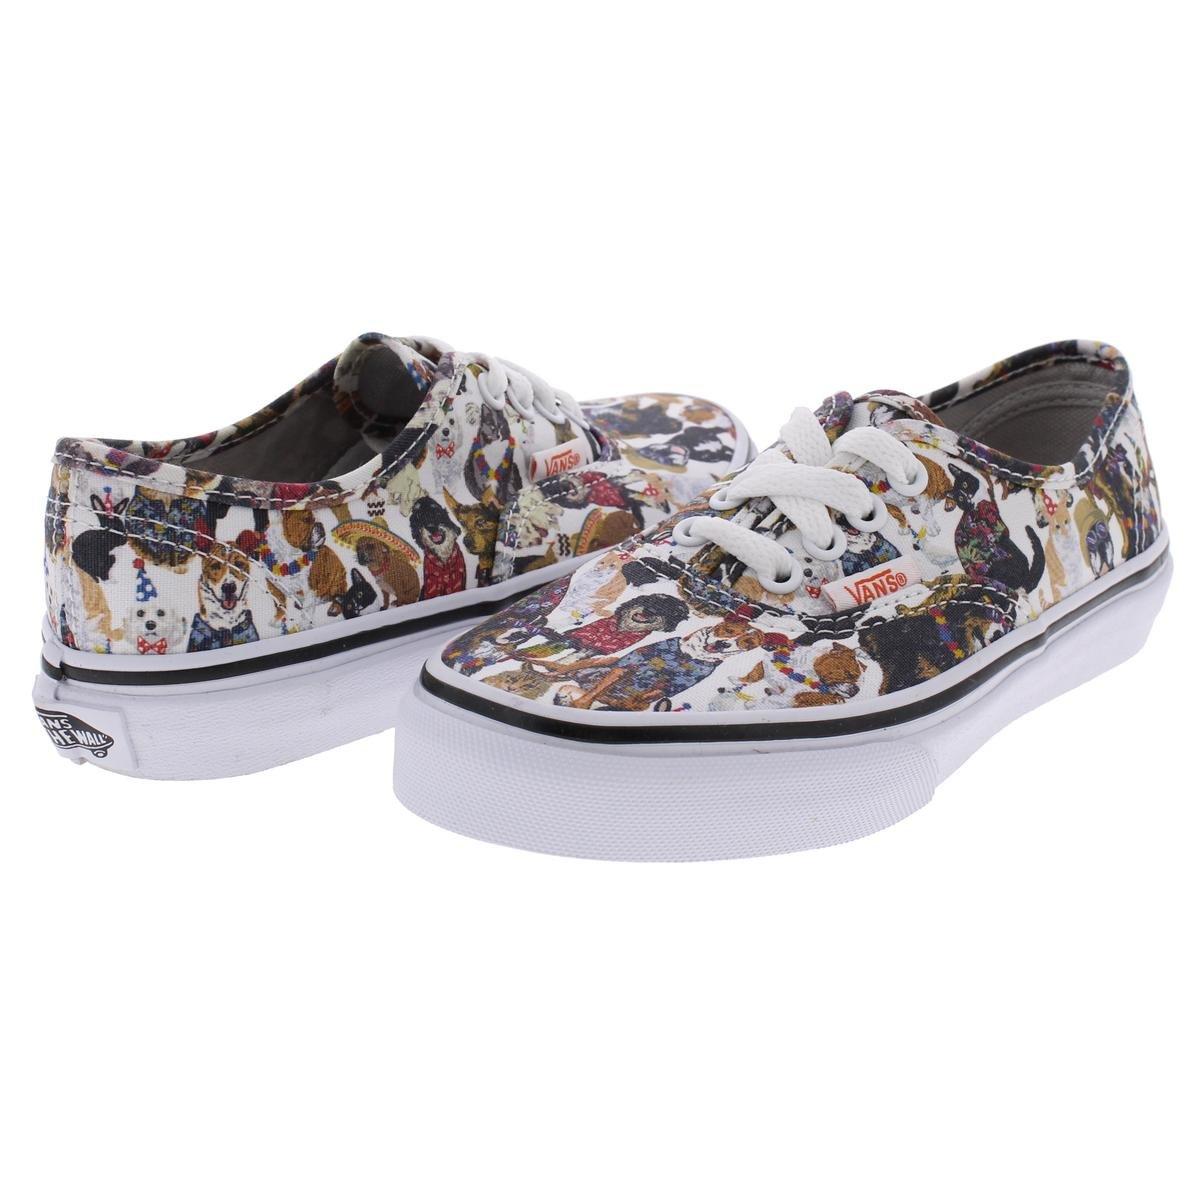 9ded671ae5 Vans Boys ASPCA Dogs Cats Skate Shoes White 1 Medium (D) Little Kid   Amazon.co.uk  Clothing